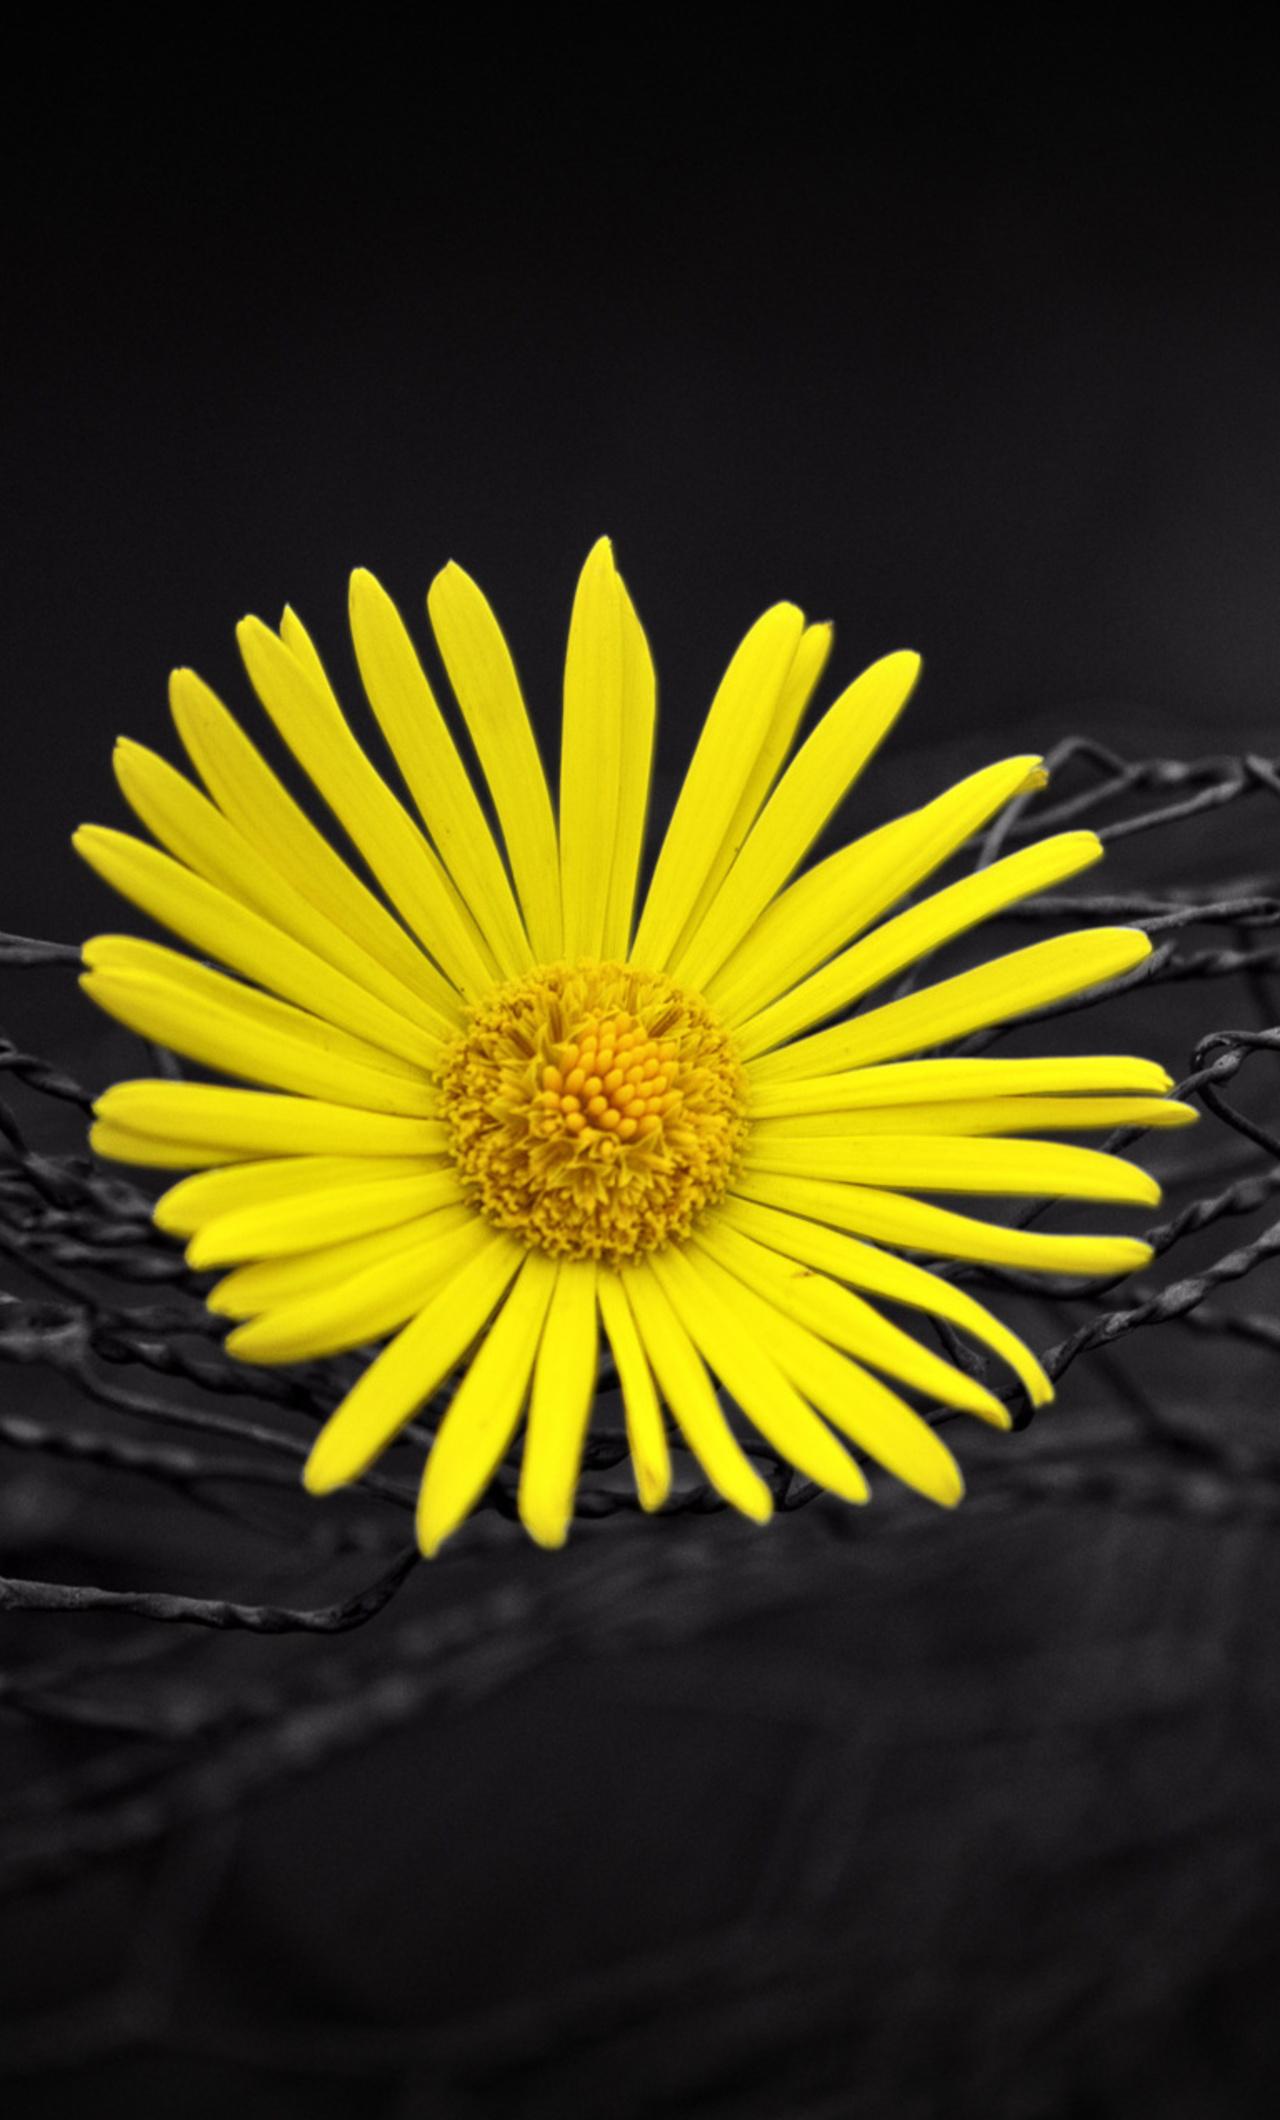 1280x2120 Yellow Flower Fence Dark Black Background Iphone 6